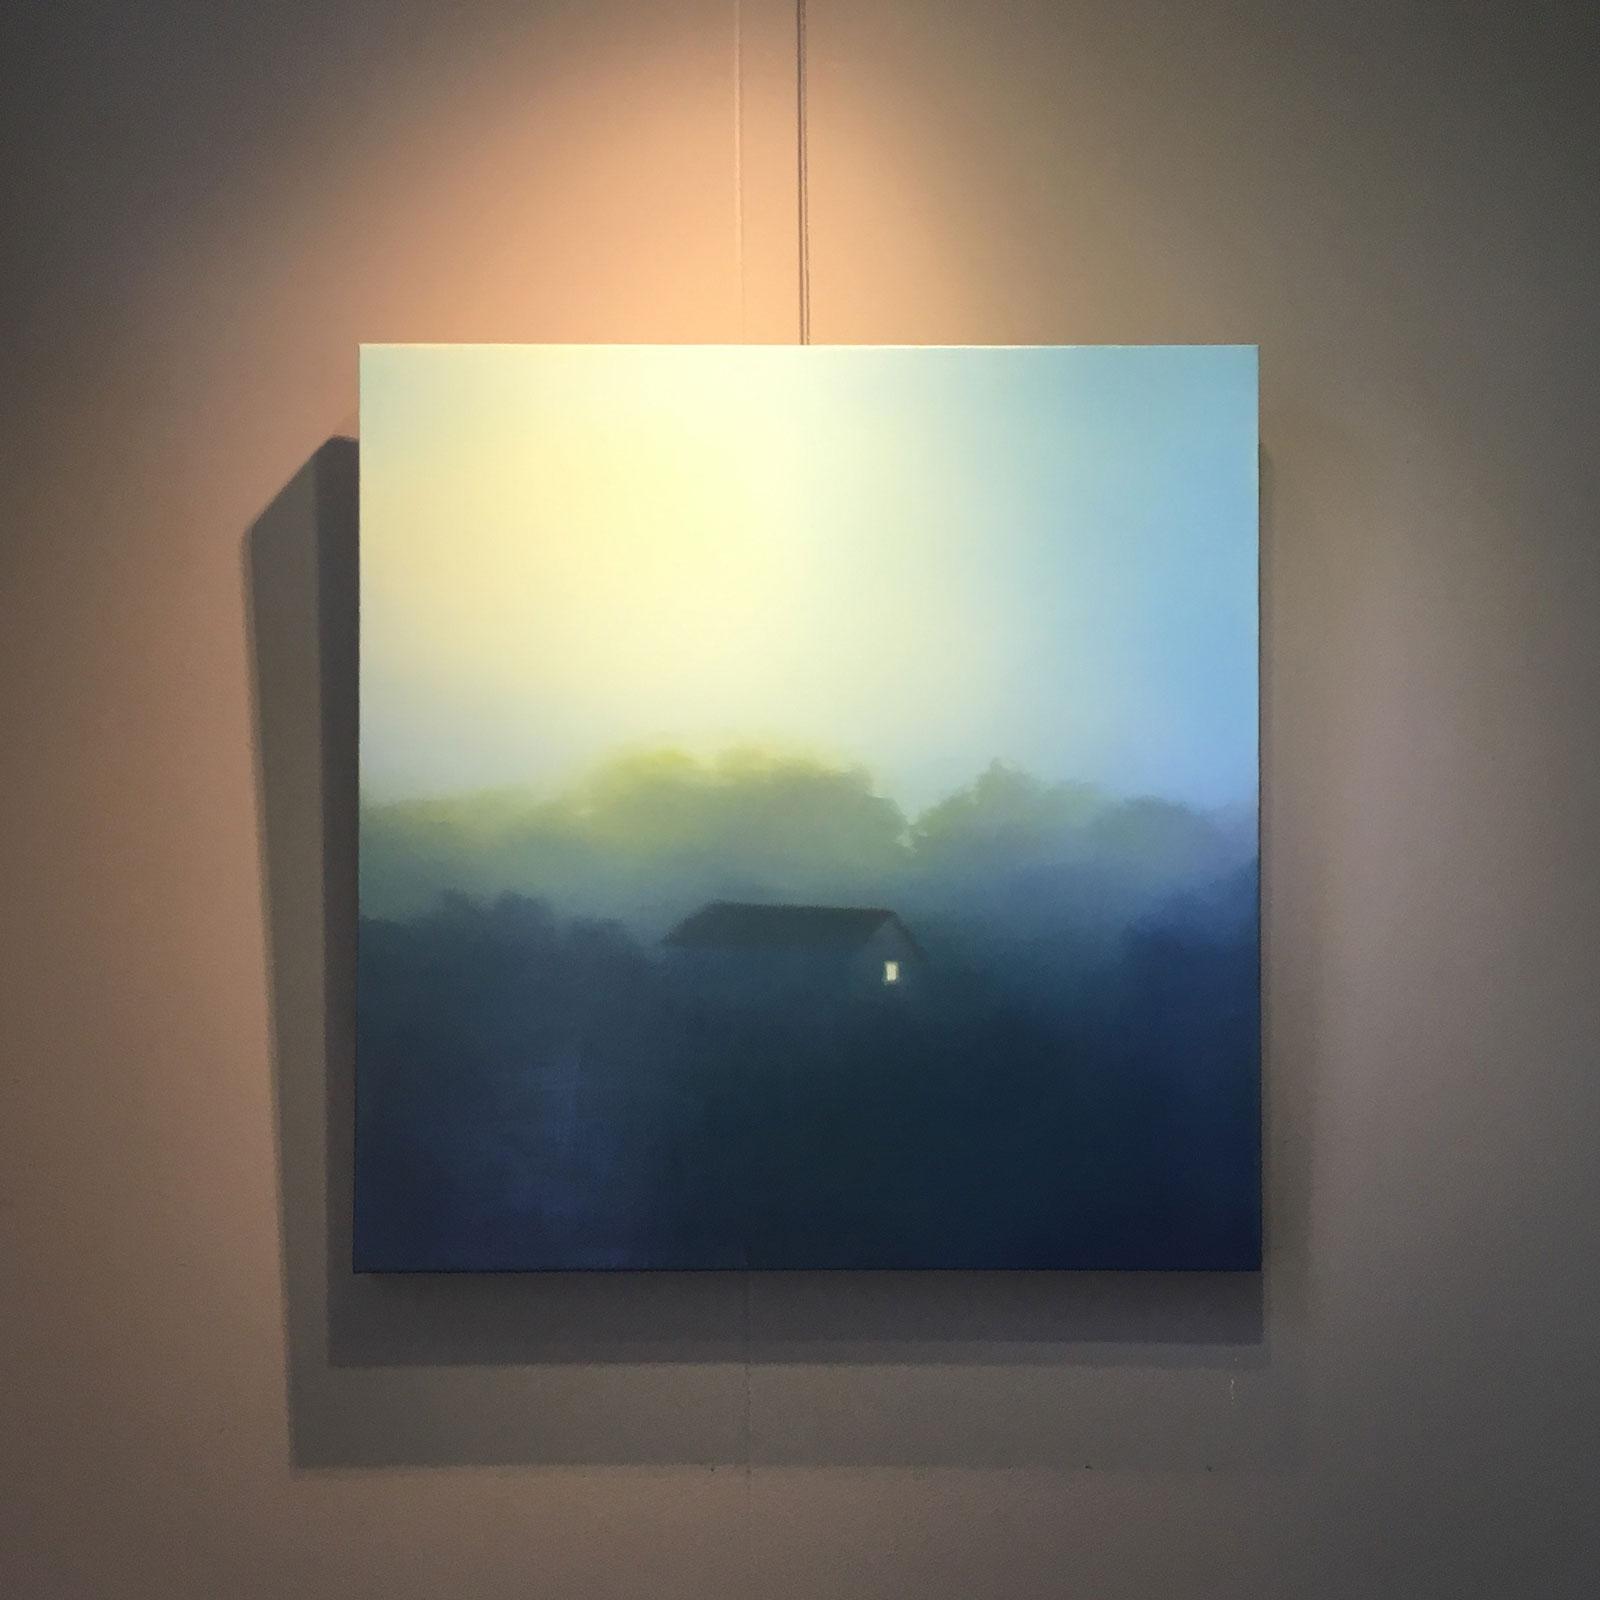 T#104-2017, oil on canvas, 50x50cm, priv. coll.